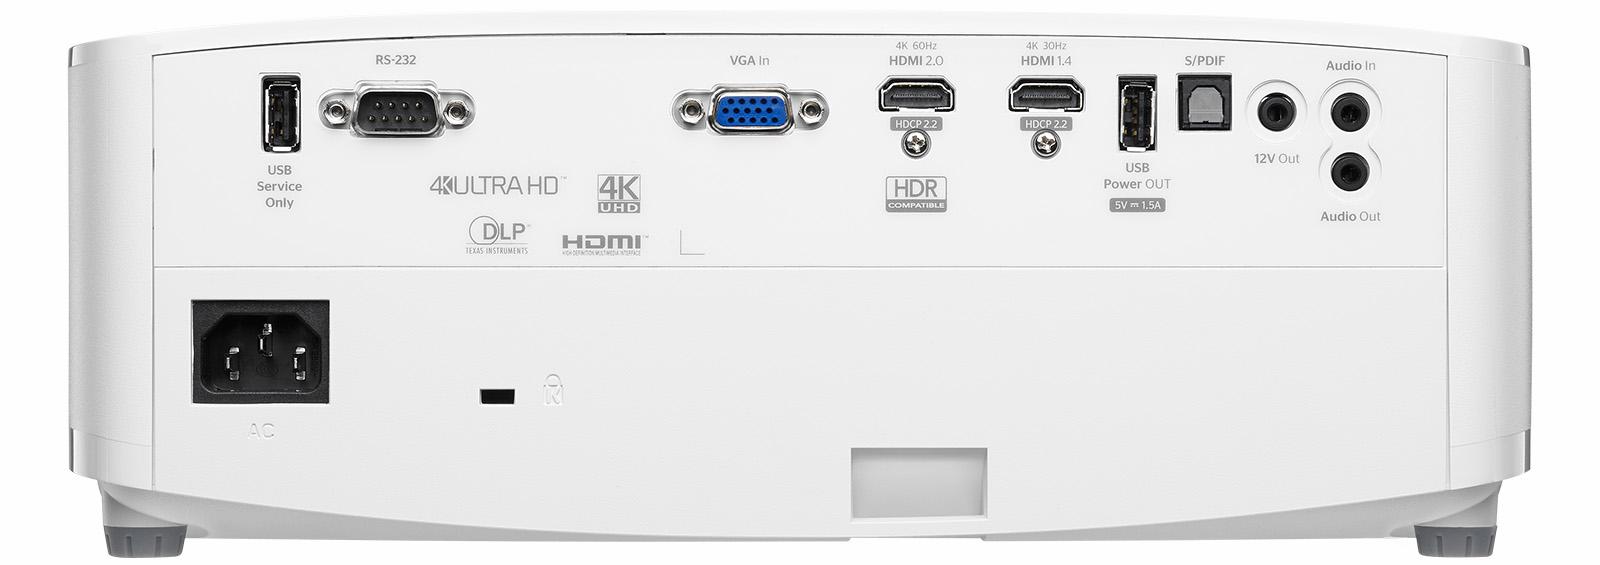 Optoma UHD50X Review (UHD50X/UHD42 - 4K DLP Projector)